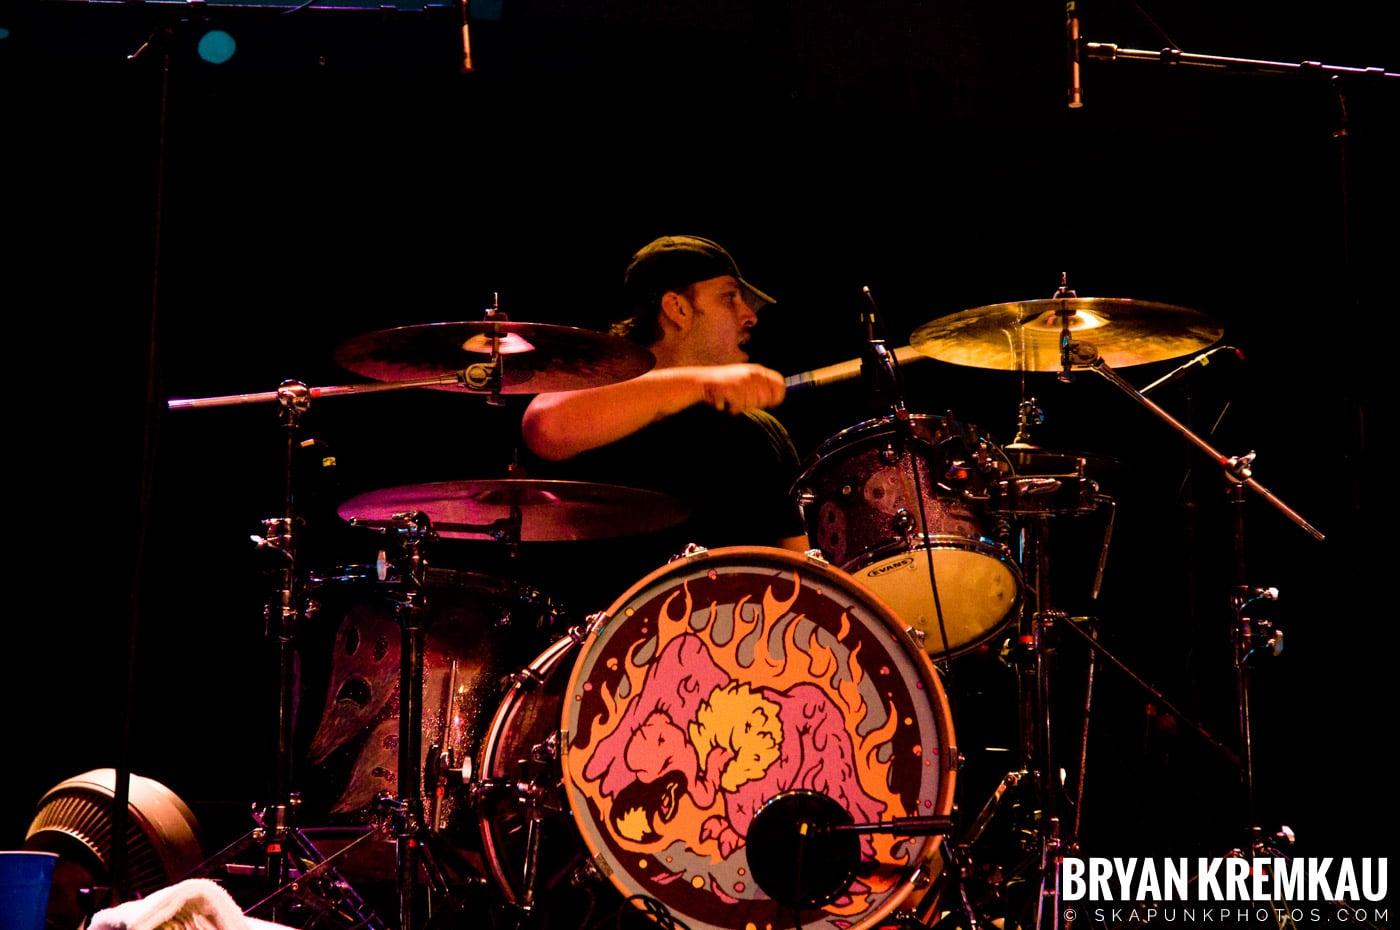 Less Than Jake @ Roseland Ballroom, NYC - 6.26.08 (15)